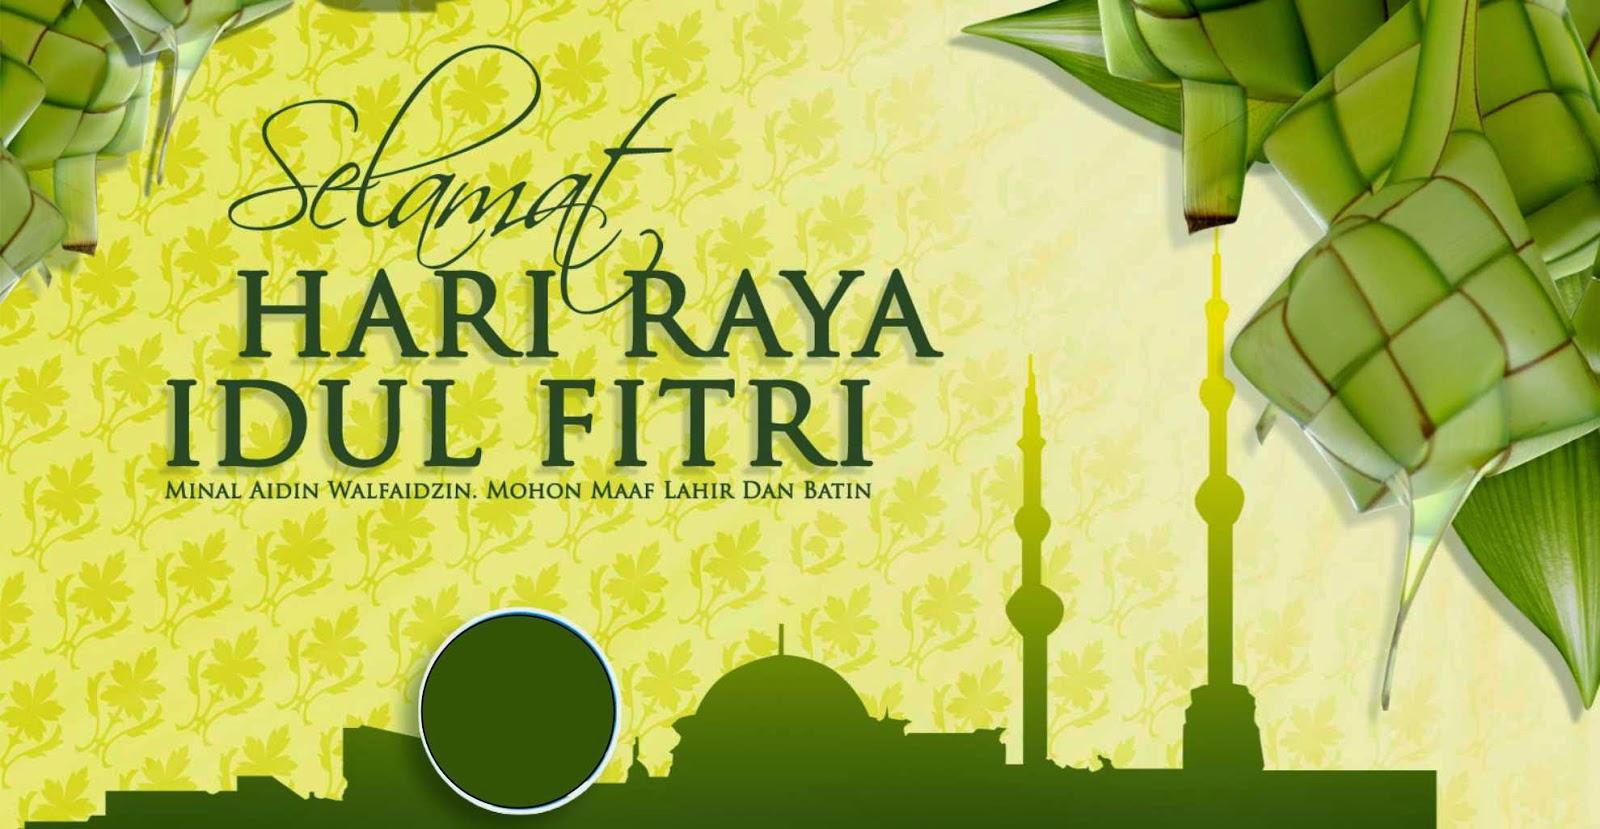 GAMBAR KARTU UCAPAN LEBARAN 2017 Gambar Selamat Idul Fitri 1438 H